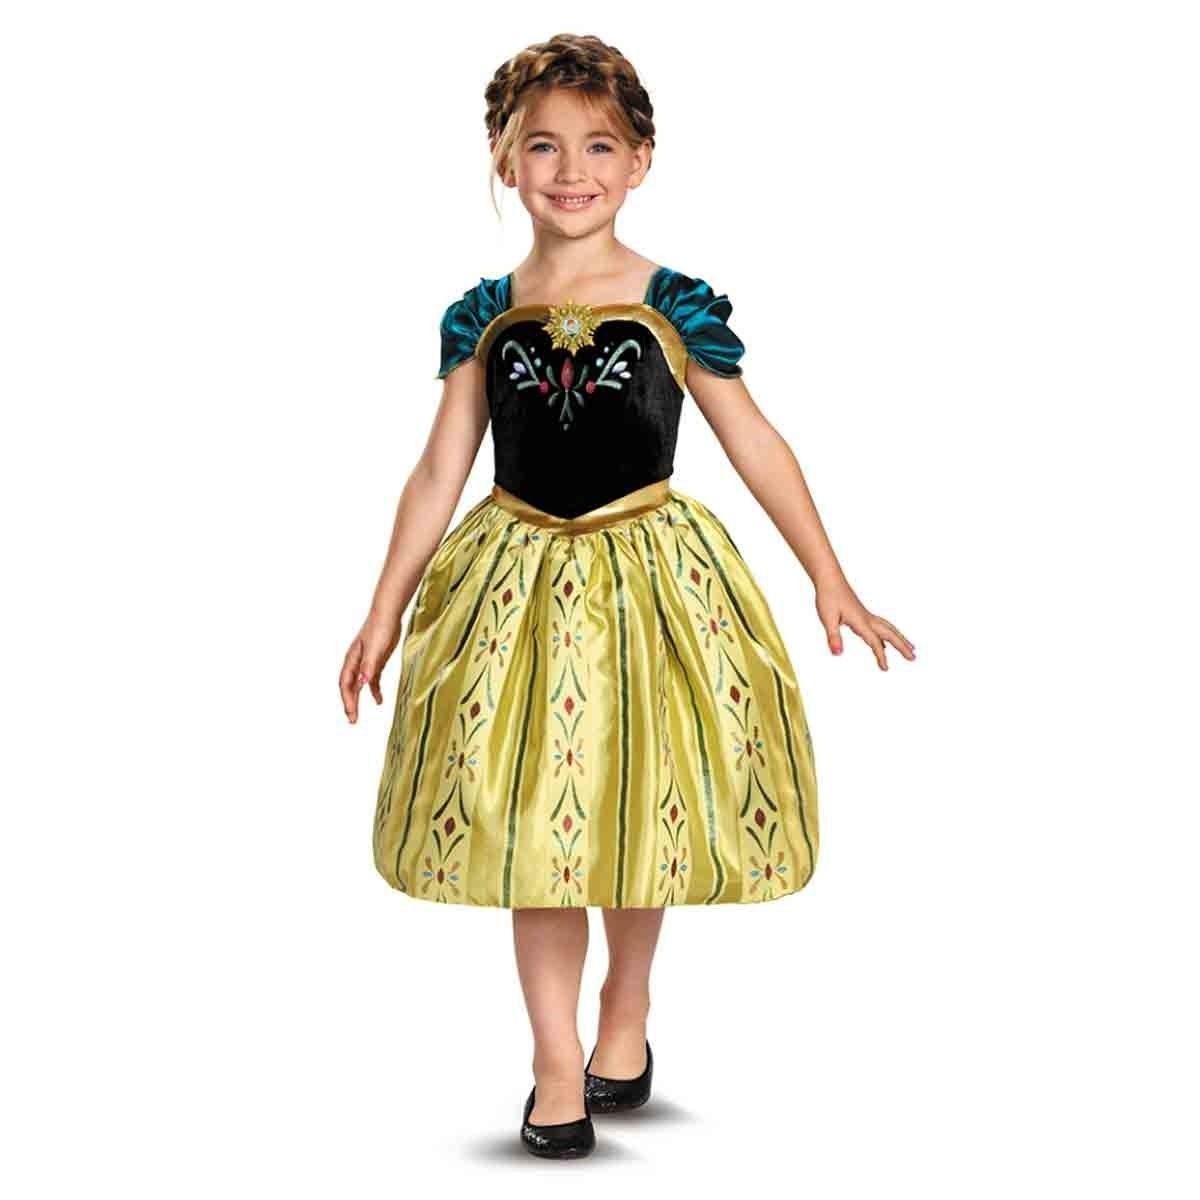 Image 1 of Disney Frozen Princess Anna Classic Coronation Gown Child Costume 76903 - Gold -